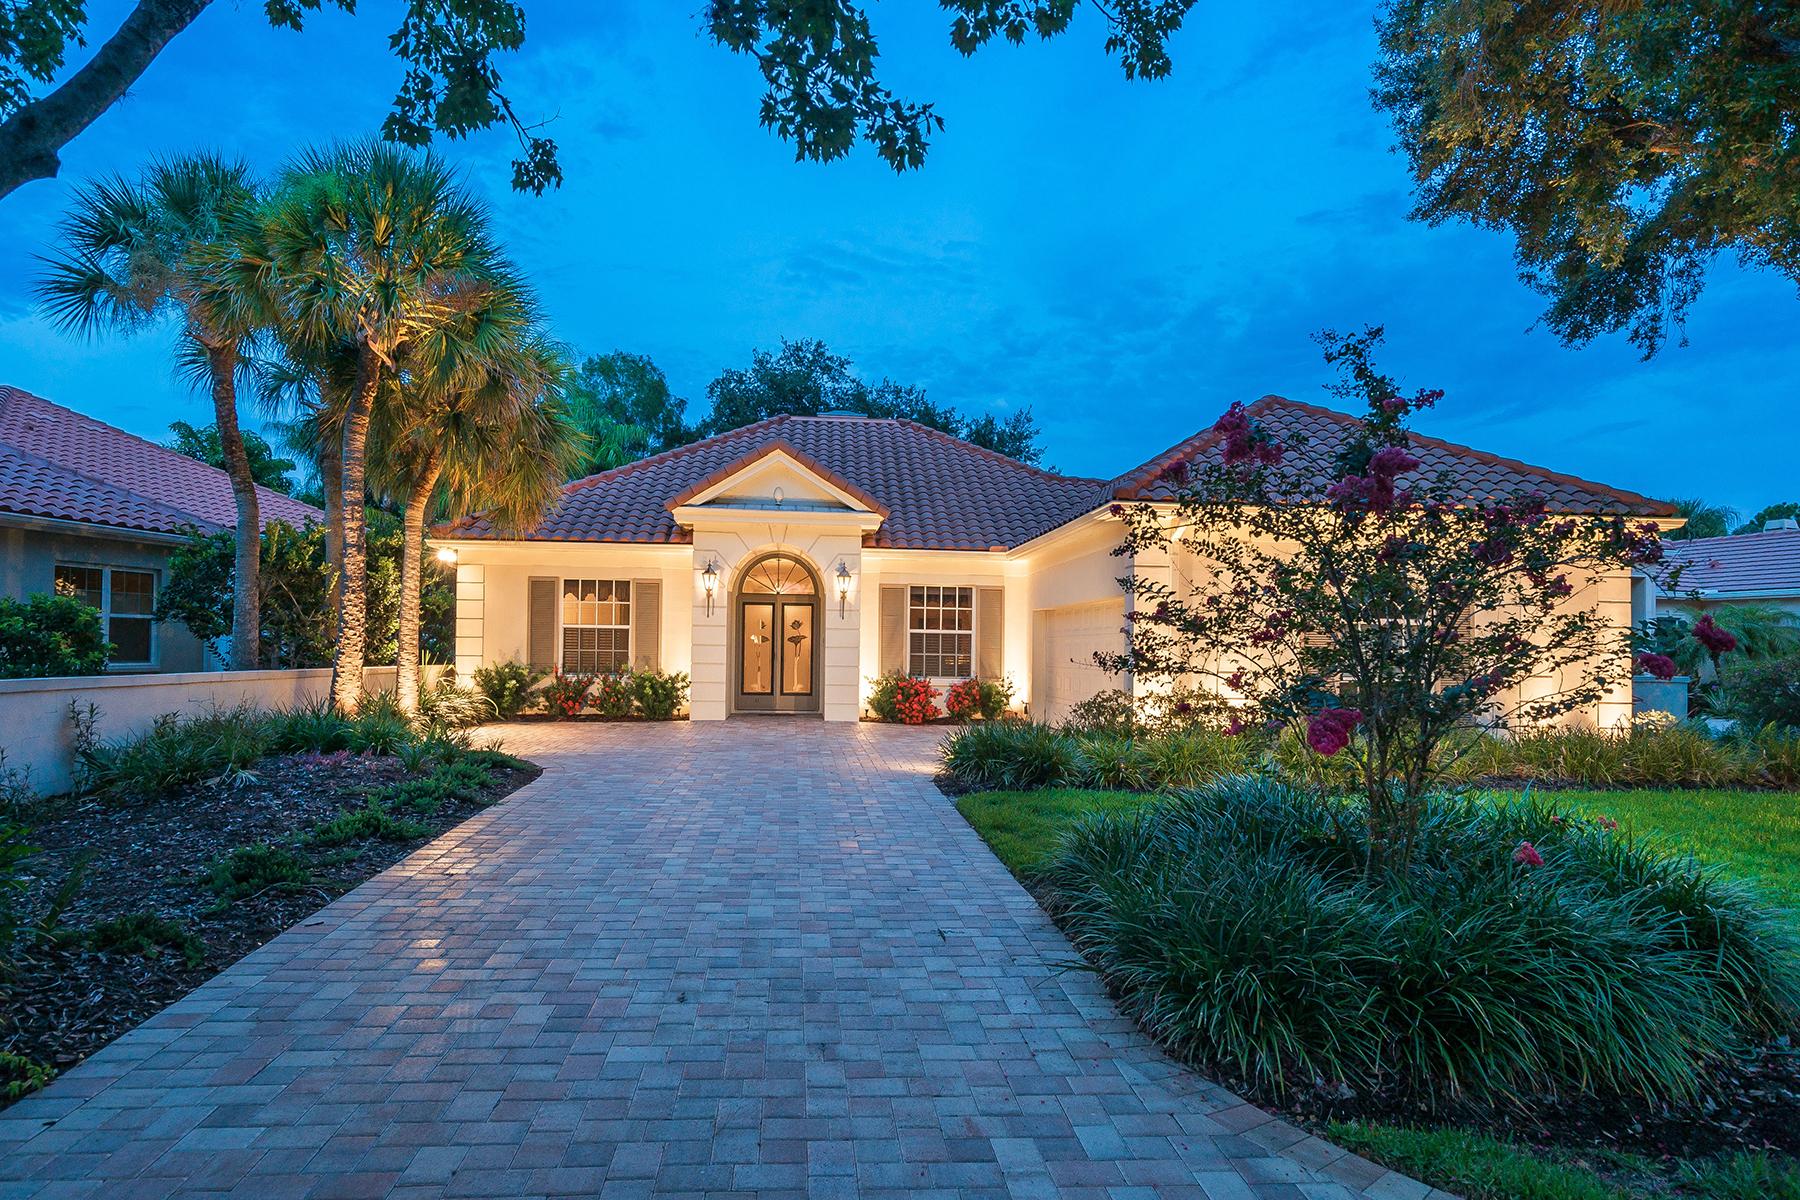 Single Family Homes for Sale at BOCA ROYALE 41 Saint John Blvd Englewood, Florida 34223 United States